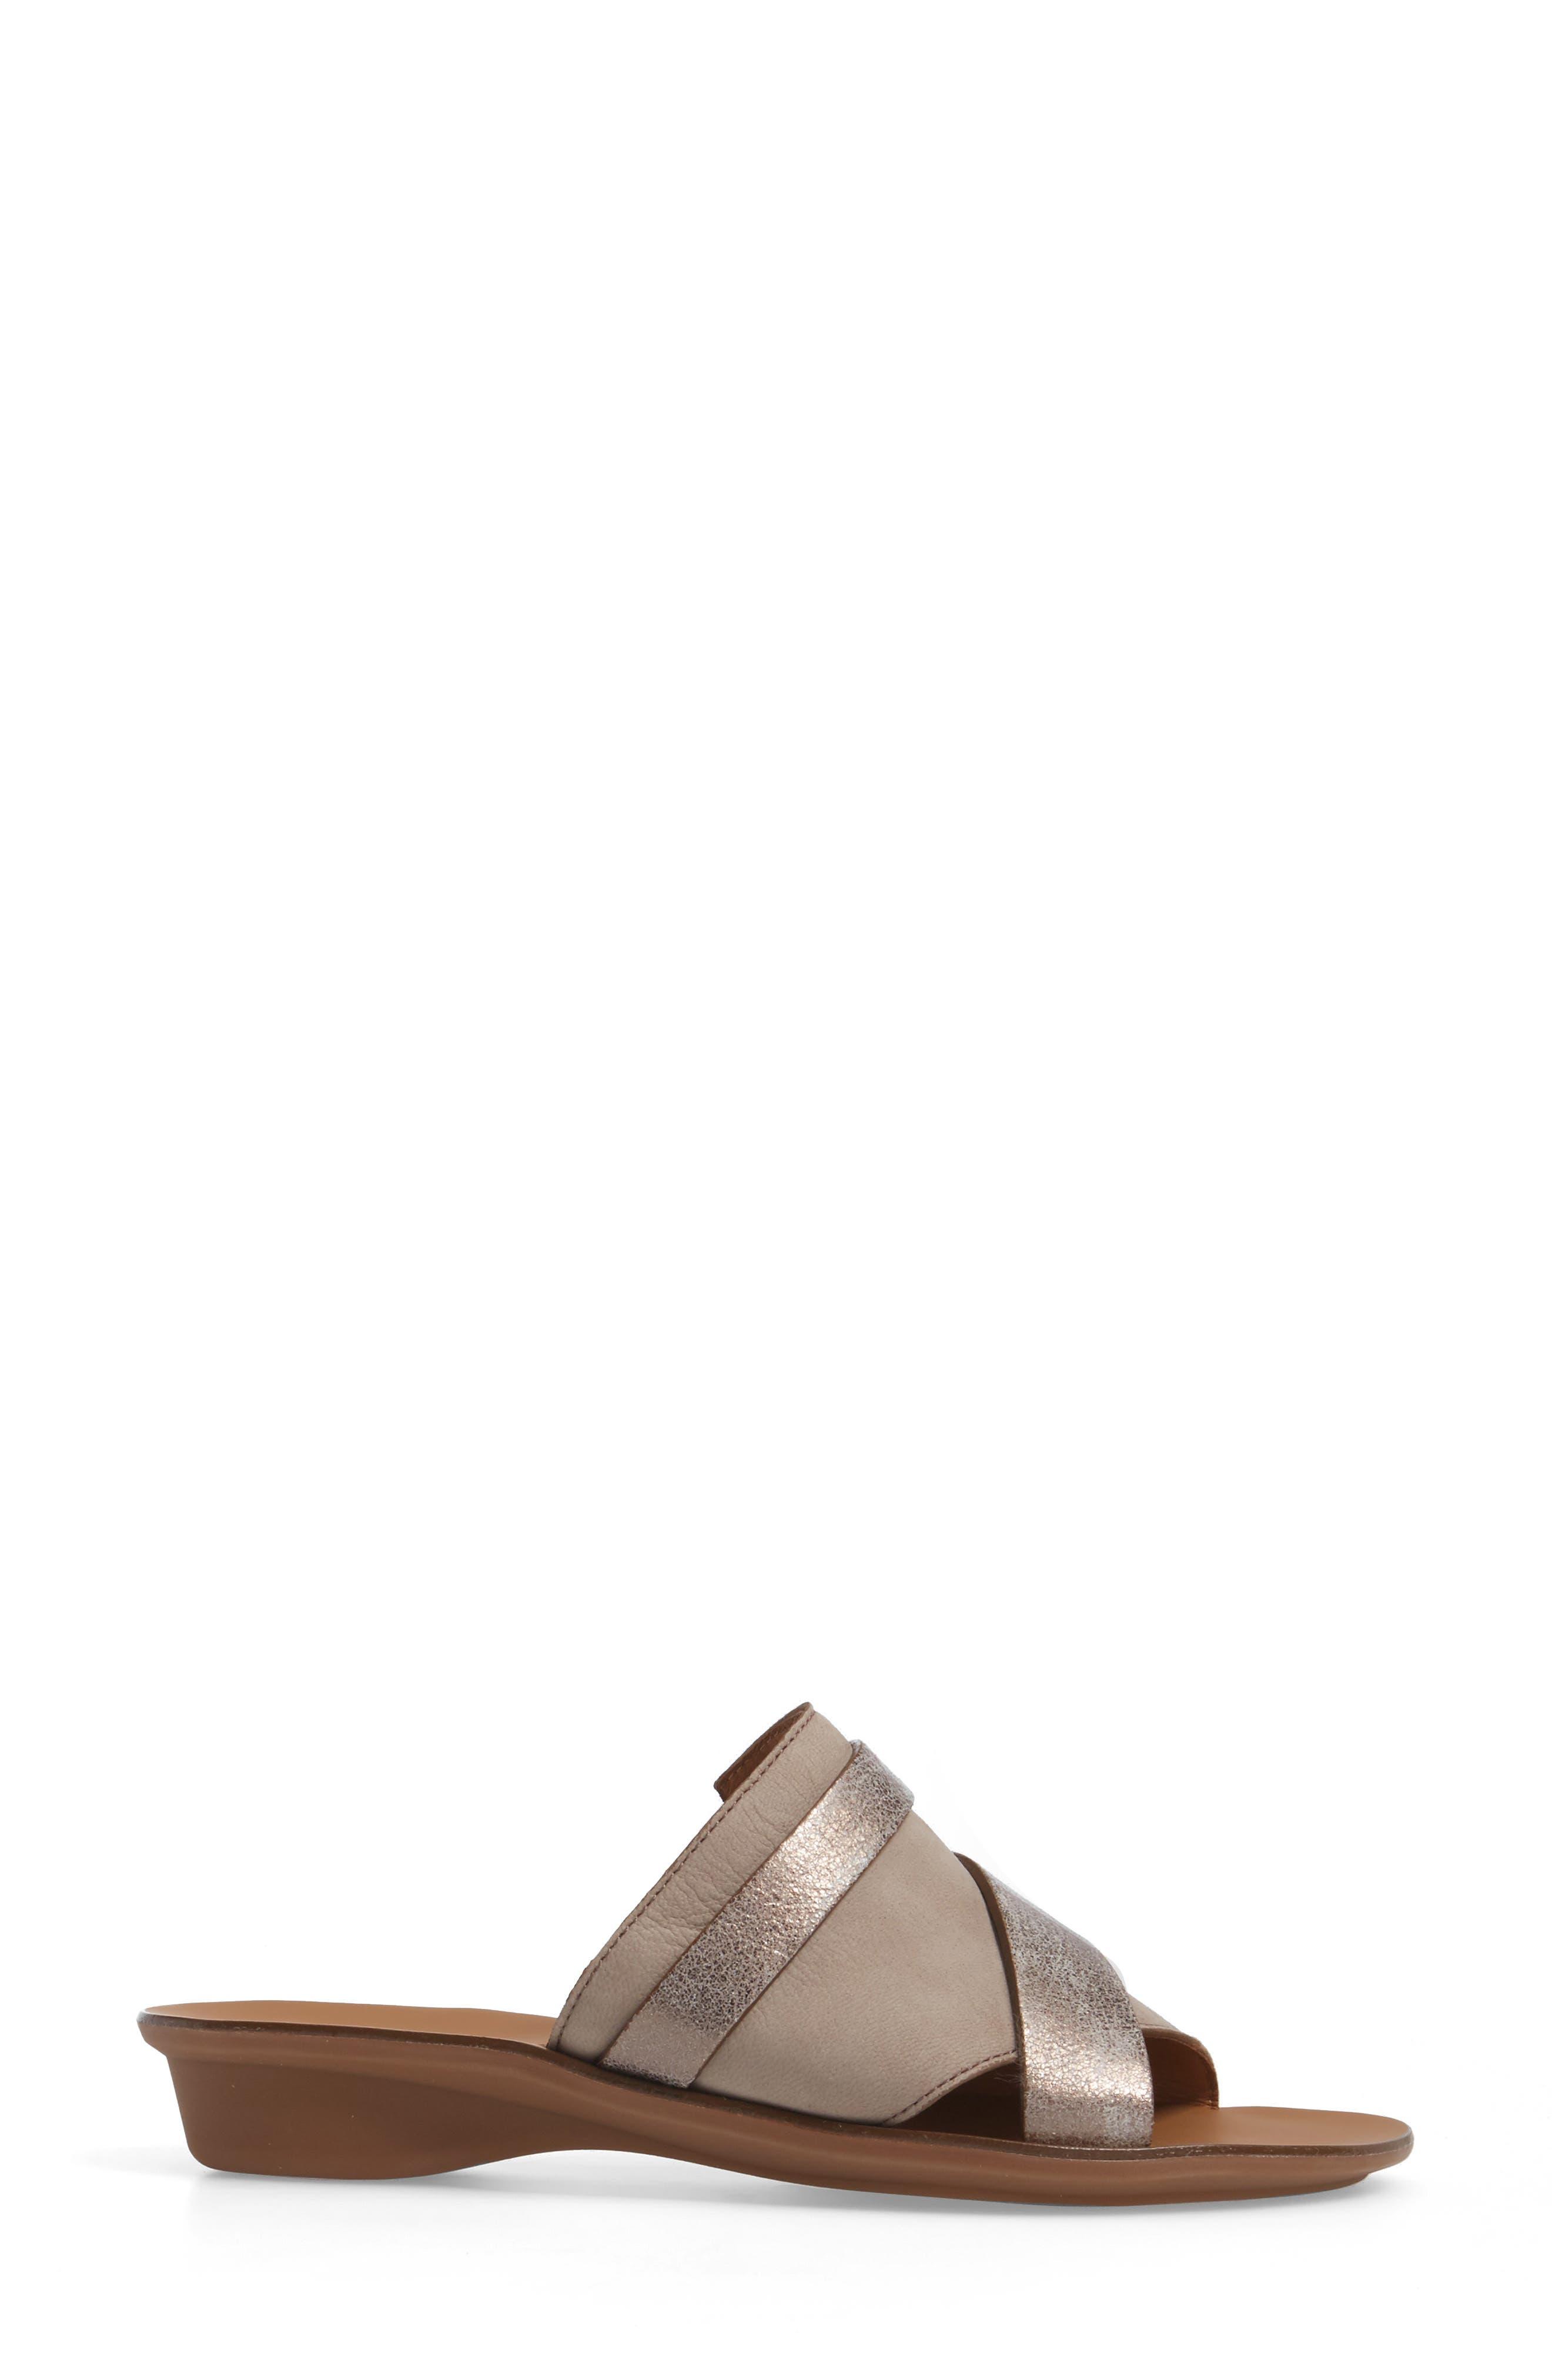 'Bayside' Leather Sandal,                             Alternate thumbnail 3, color,                             GREY